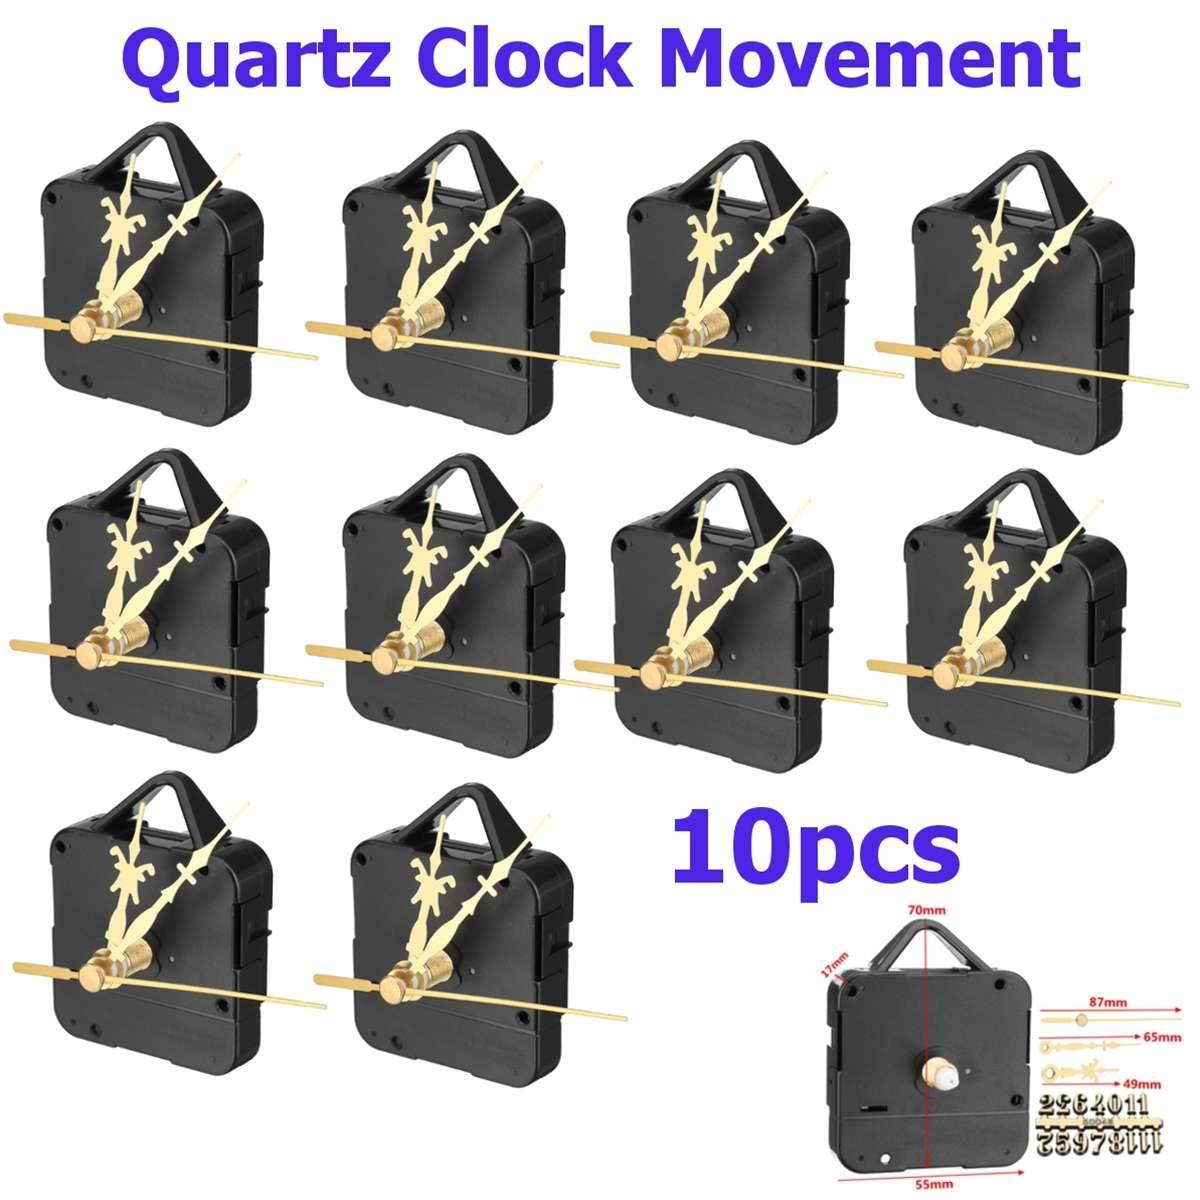 Maslin 10 PCS Silent Quartz Clock Movement Kit with Gold Digital Card Hour Minute Second Hand Quartz for Tide Clock Movement